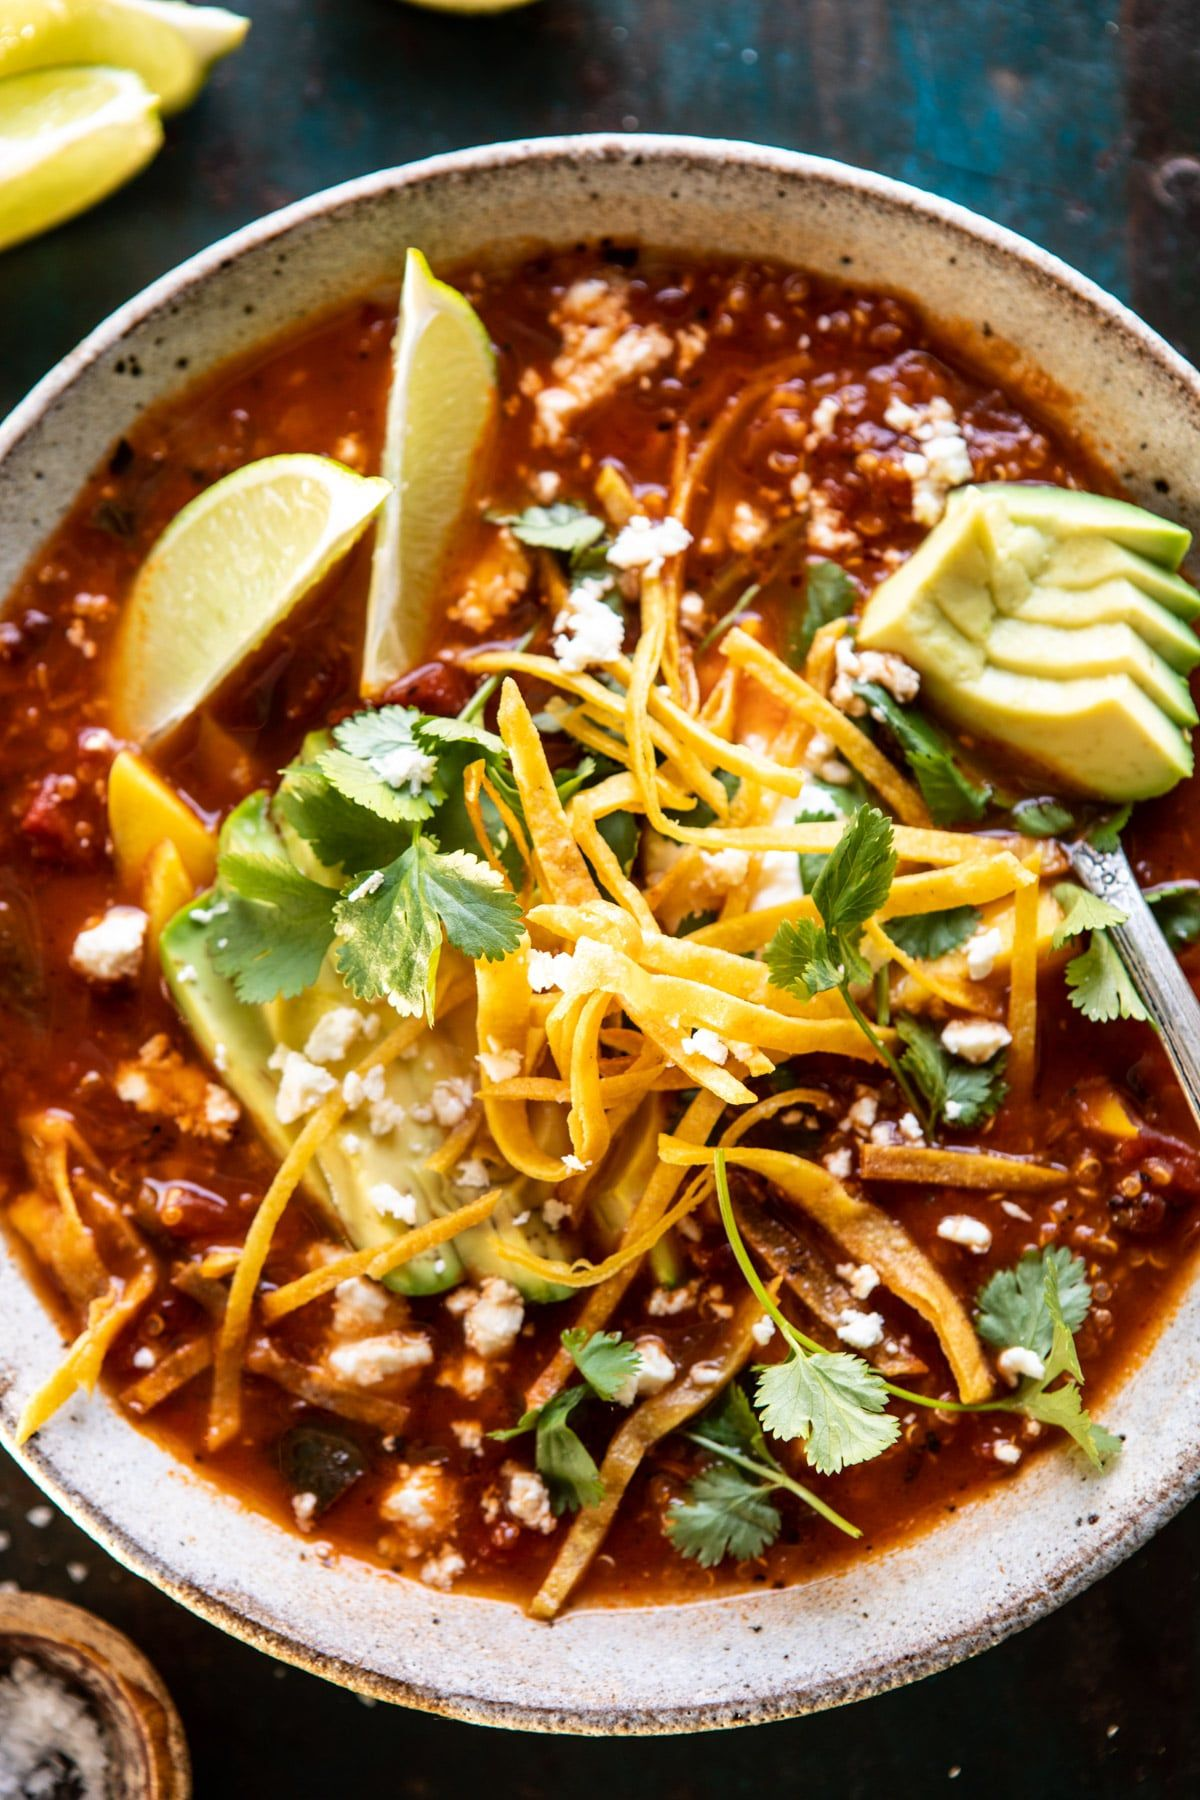 Crockpot Spicy Vegetarian Tortilla Soup with Quinoa